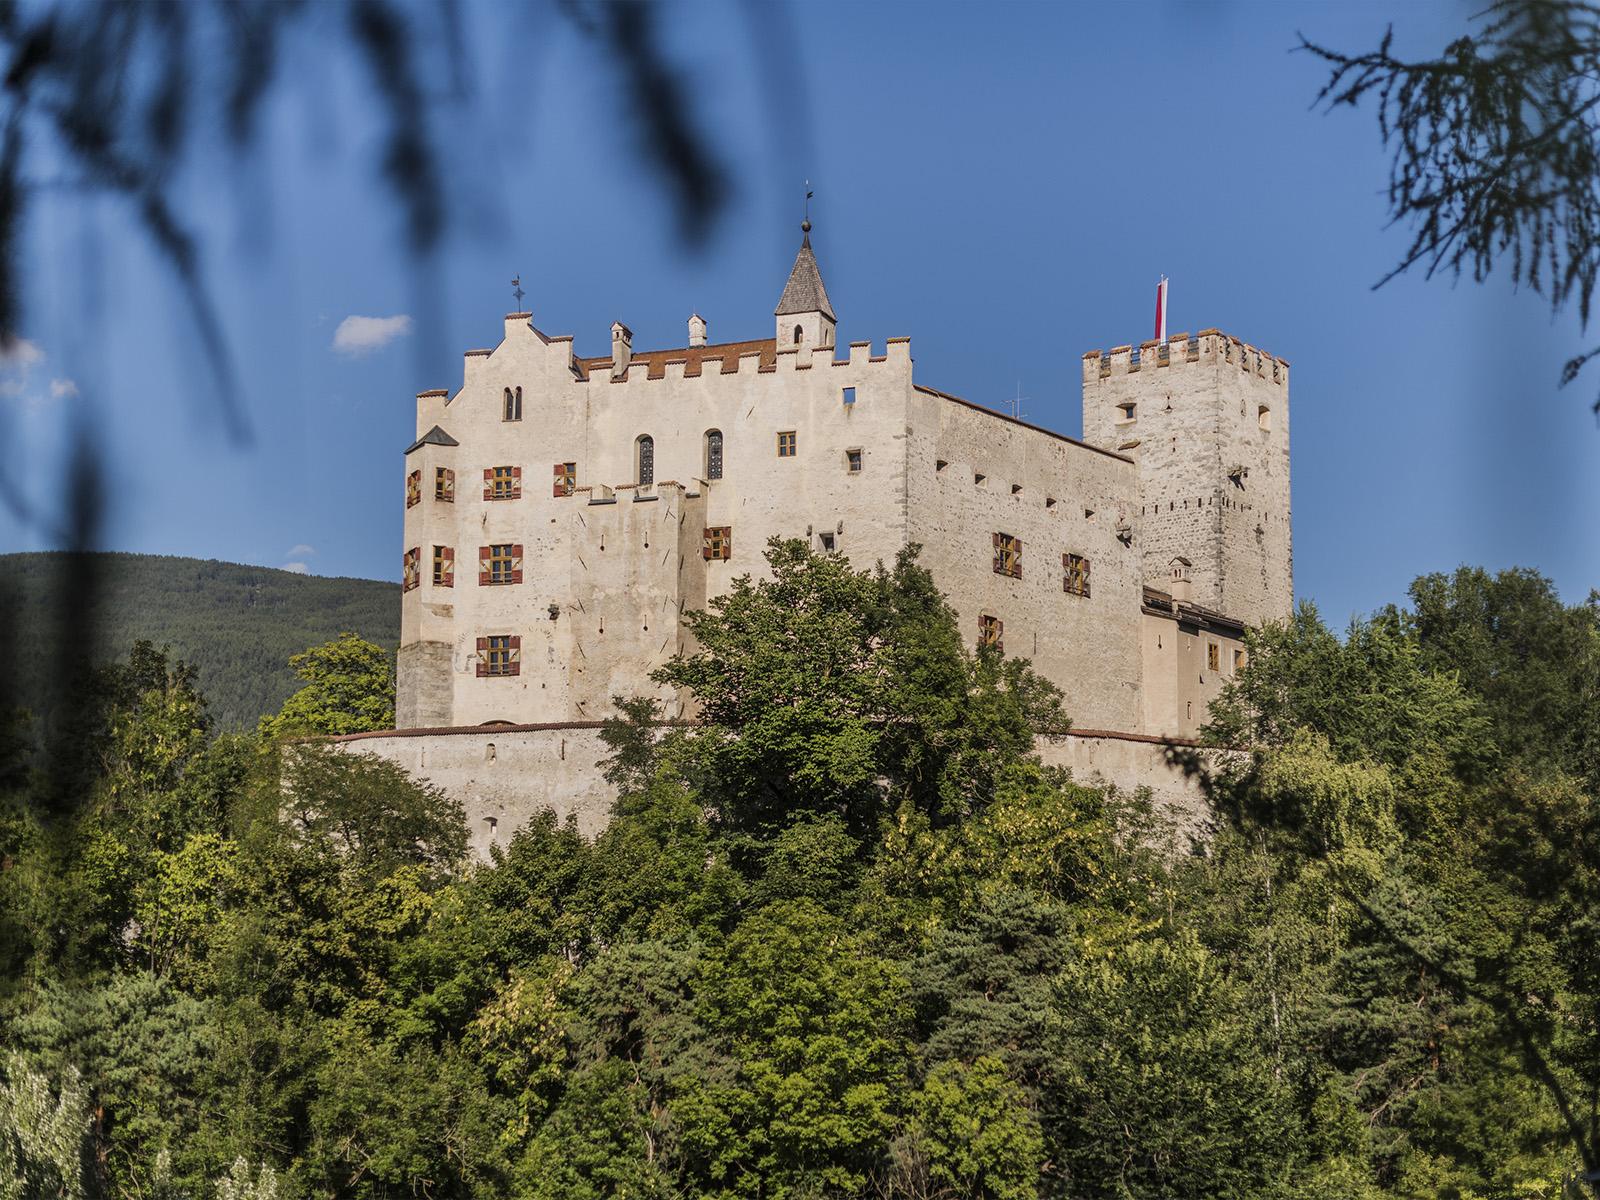 Castel Brunico